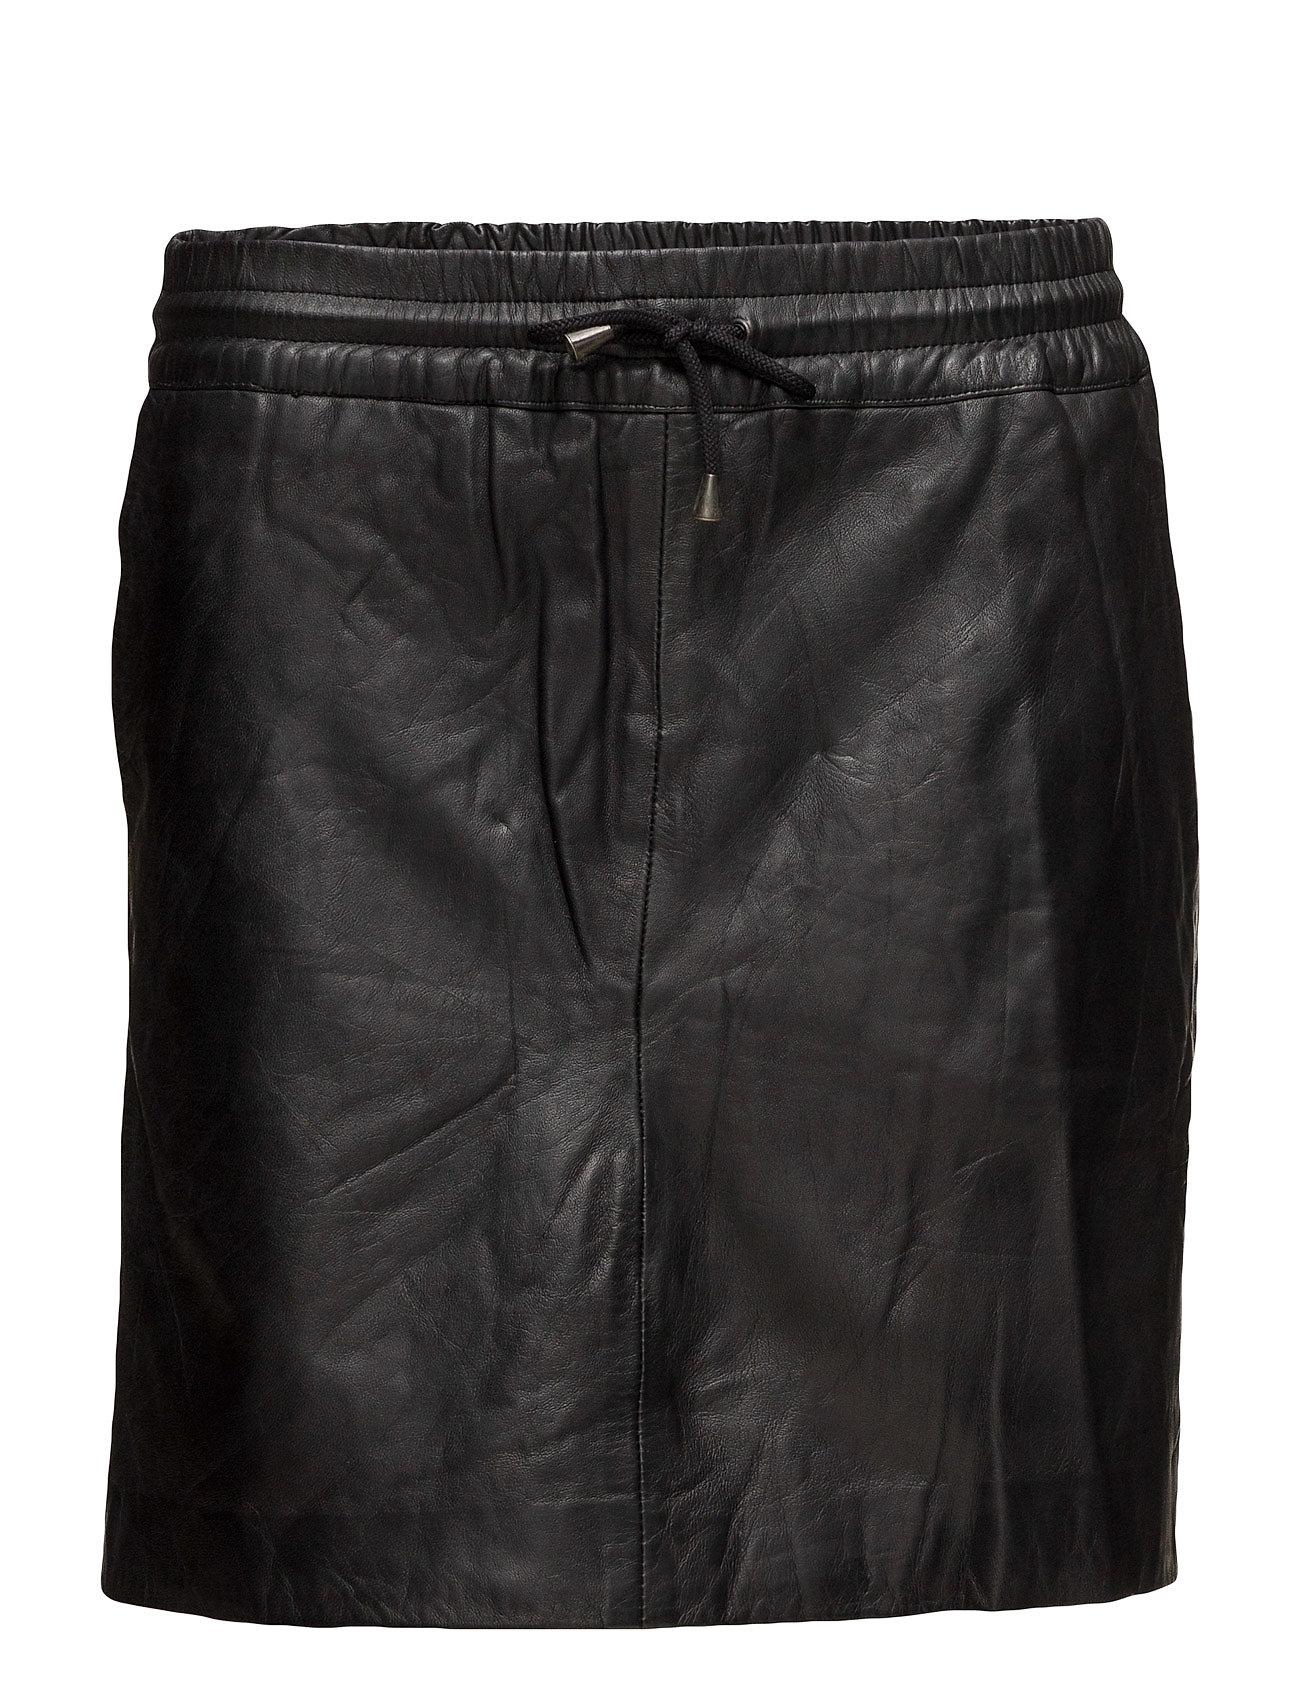 DEPECHE Skirt with smock waist - BLACK